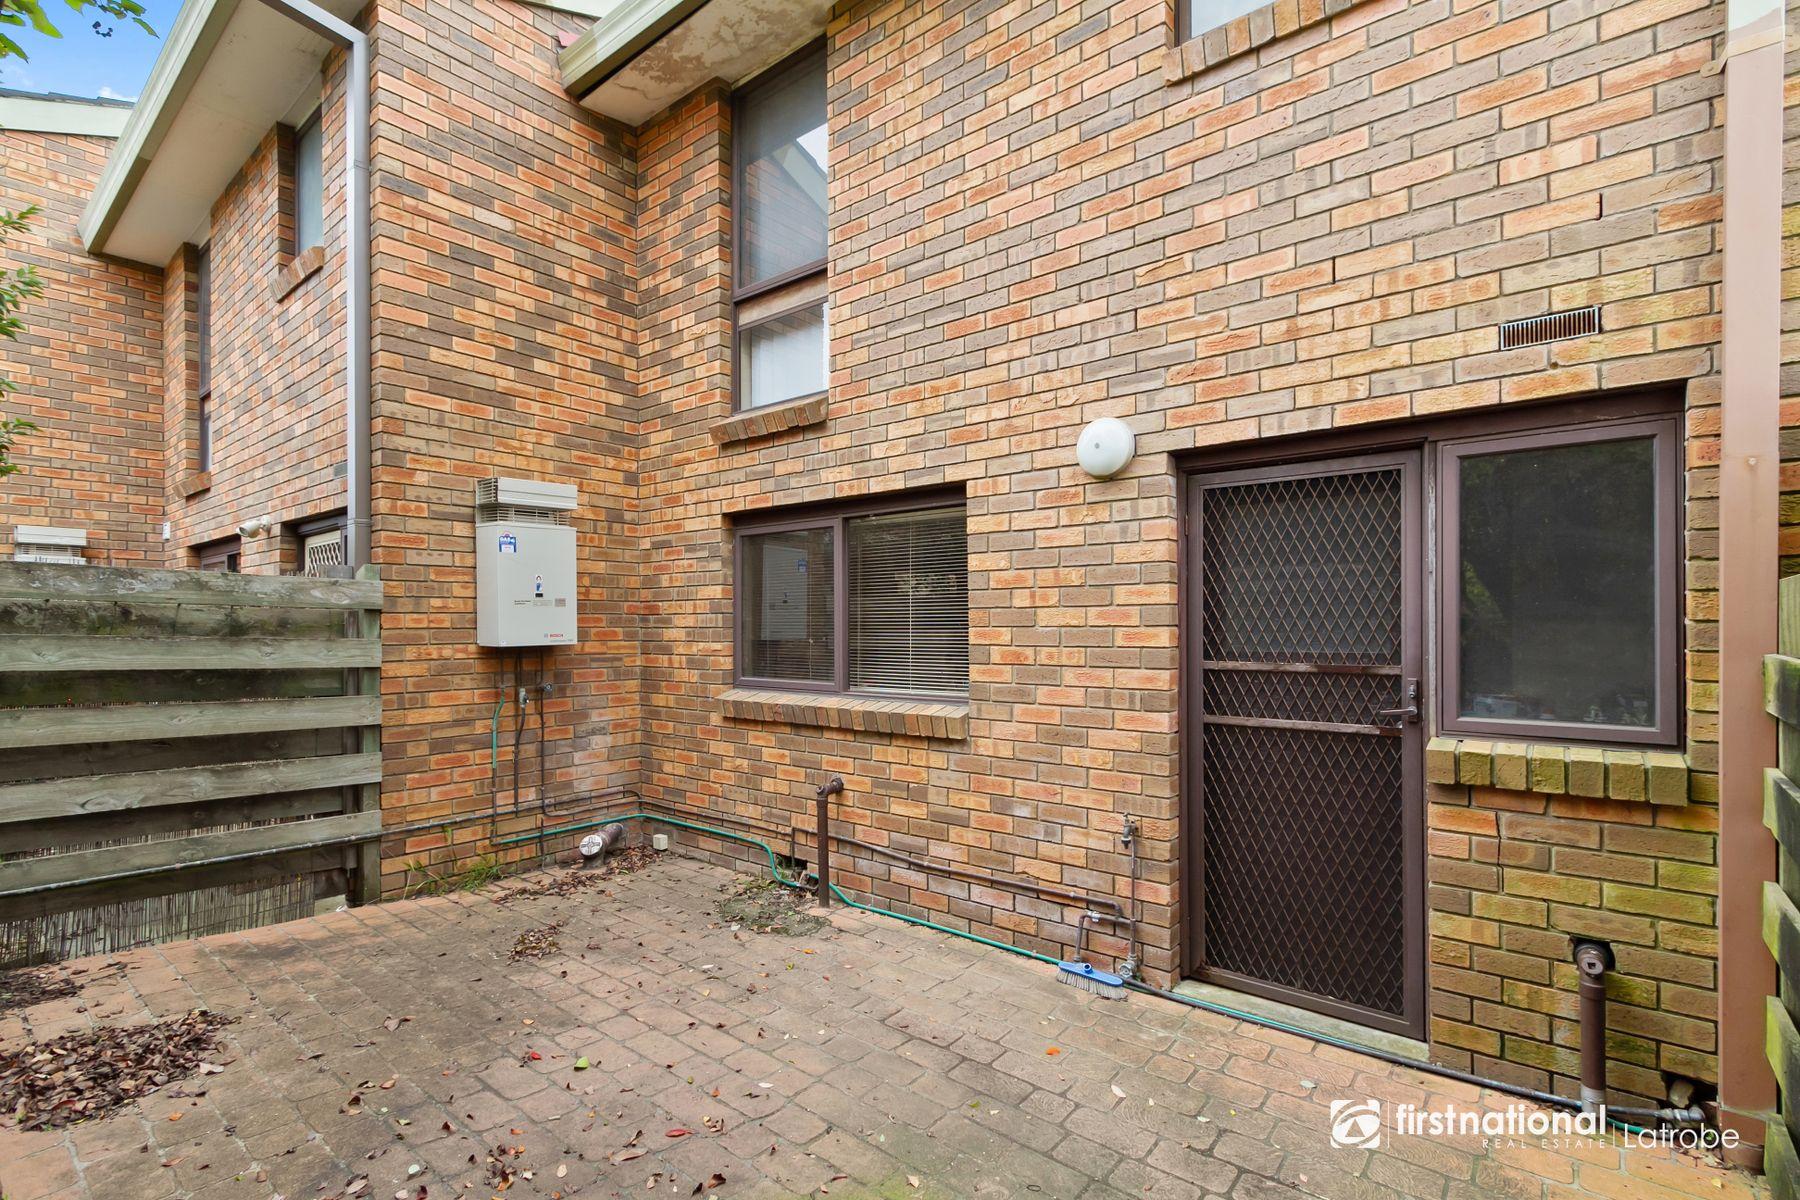 2/15 Roseneath Street, Traralgon, VIC 3844